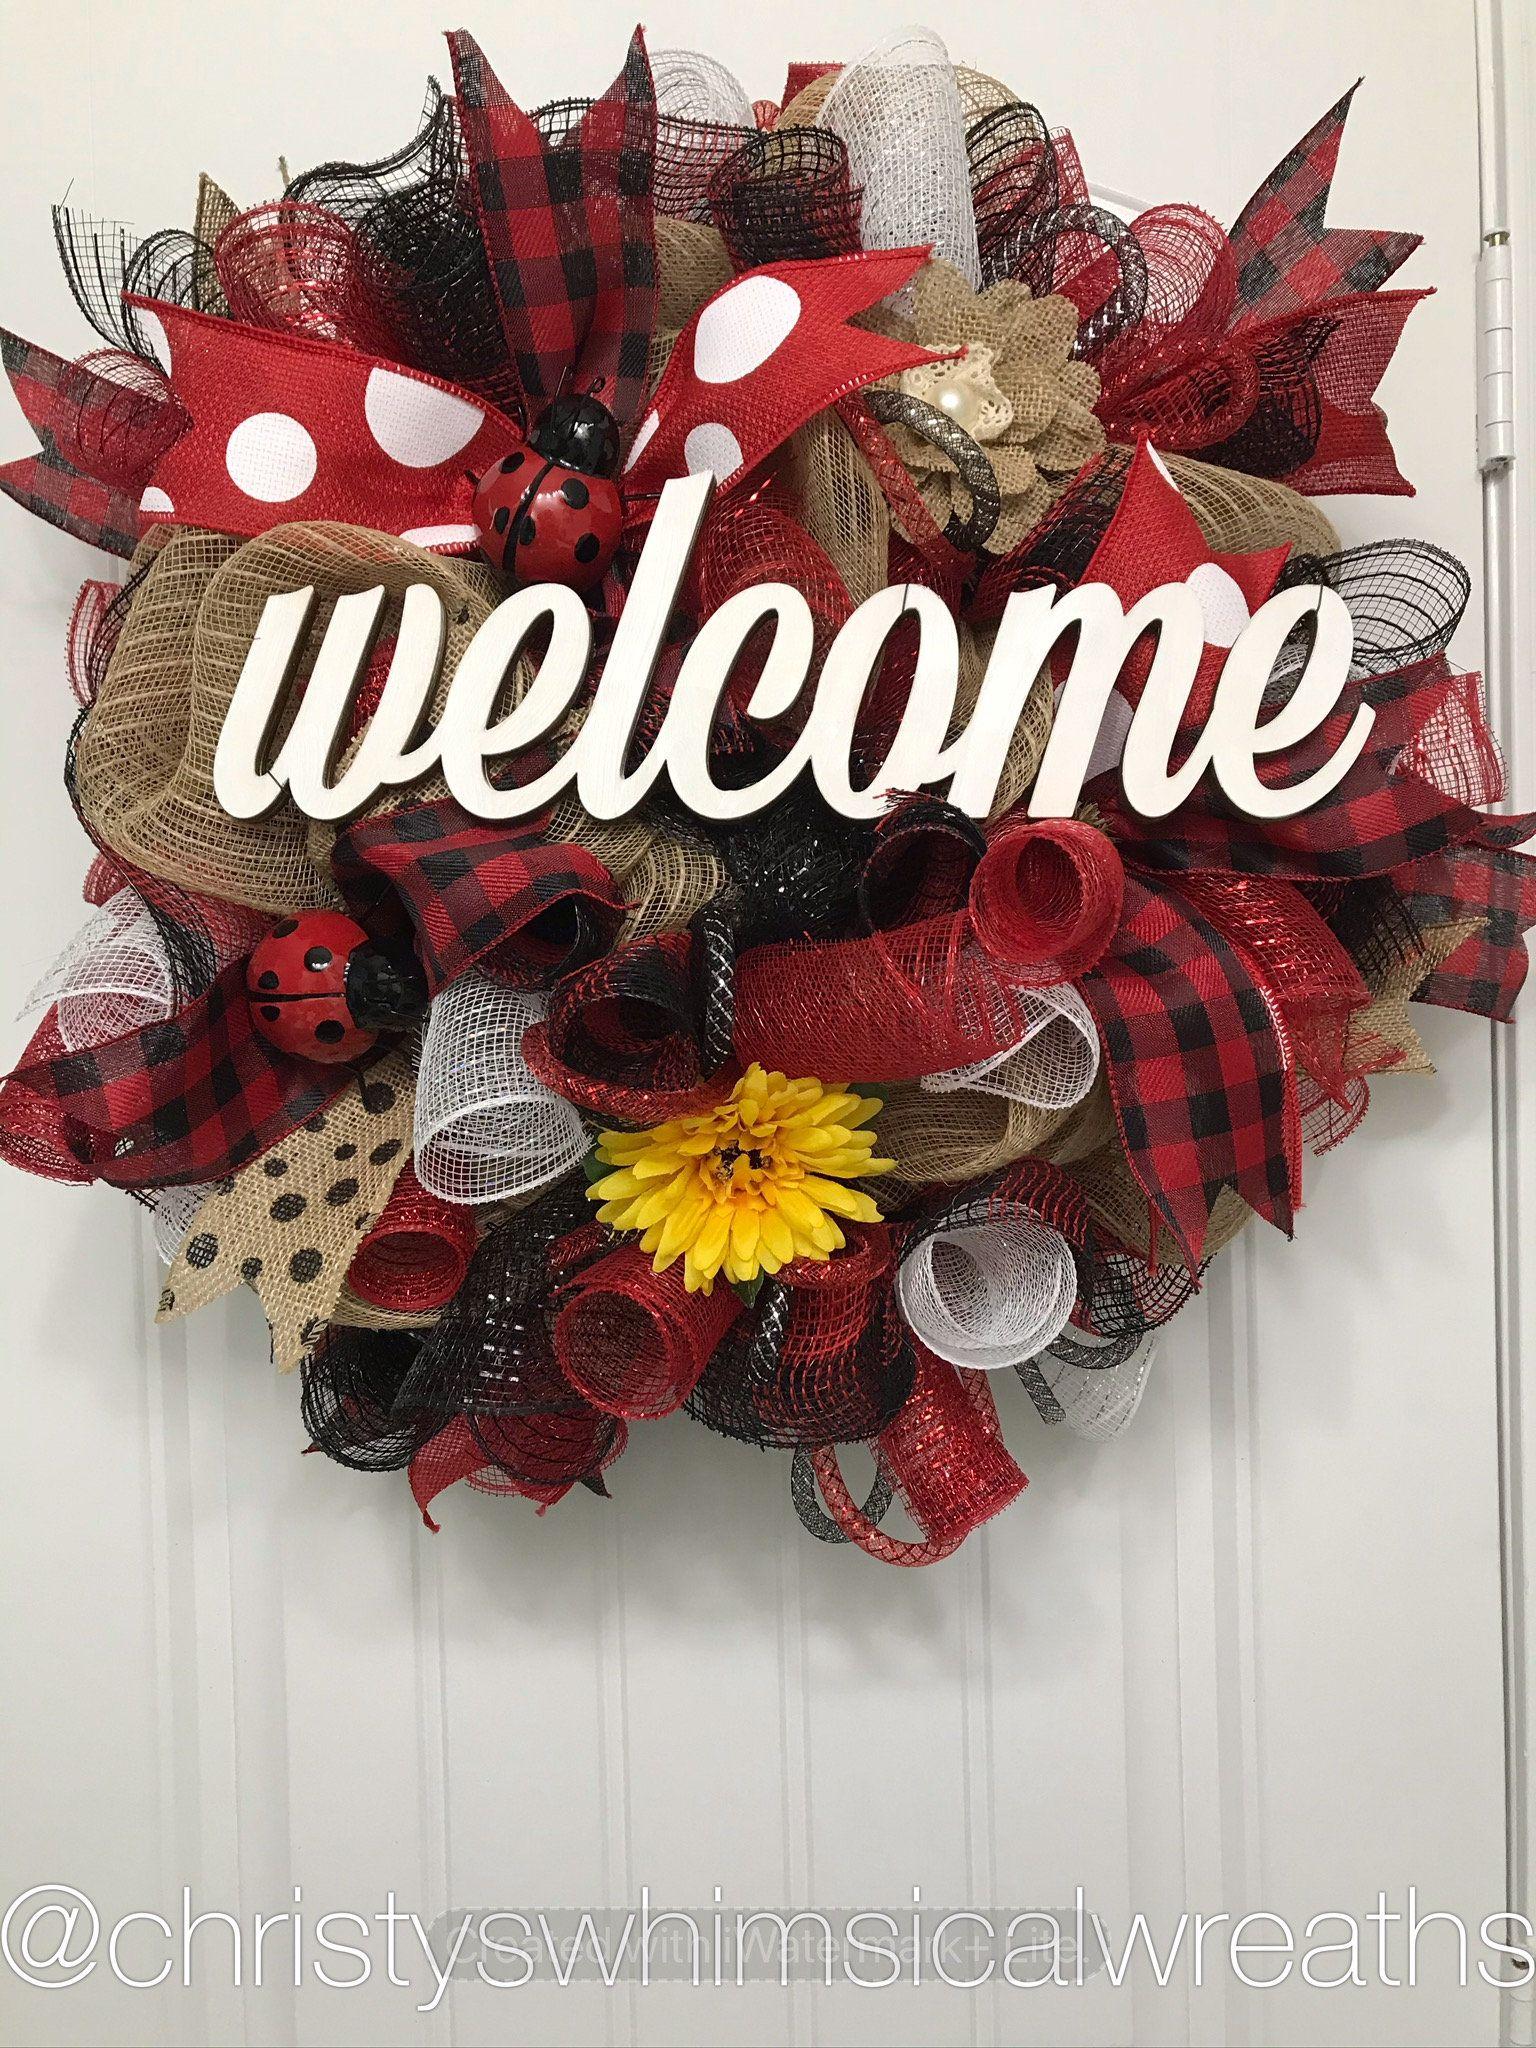 Photo of Ladybug wreath, summer wreath, sunflower wreath, burlap red black wreath, peasant wreath, spring wreath, whimsical wreath, Mother's Day